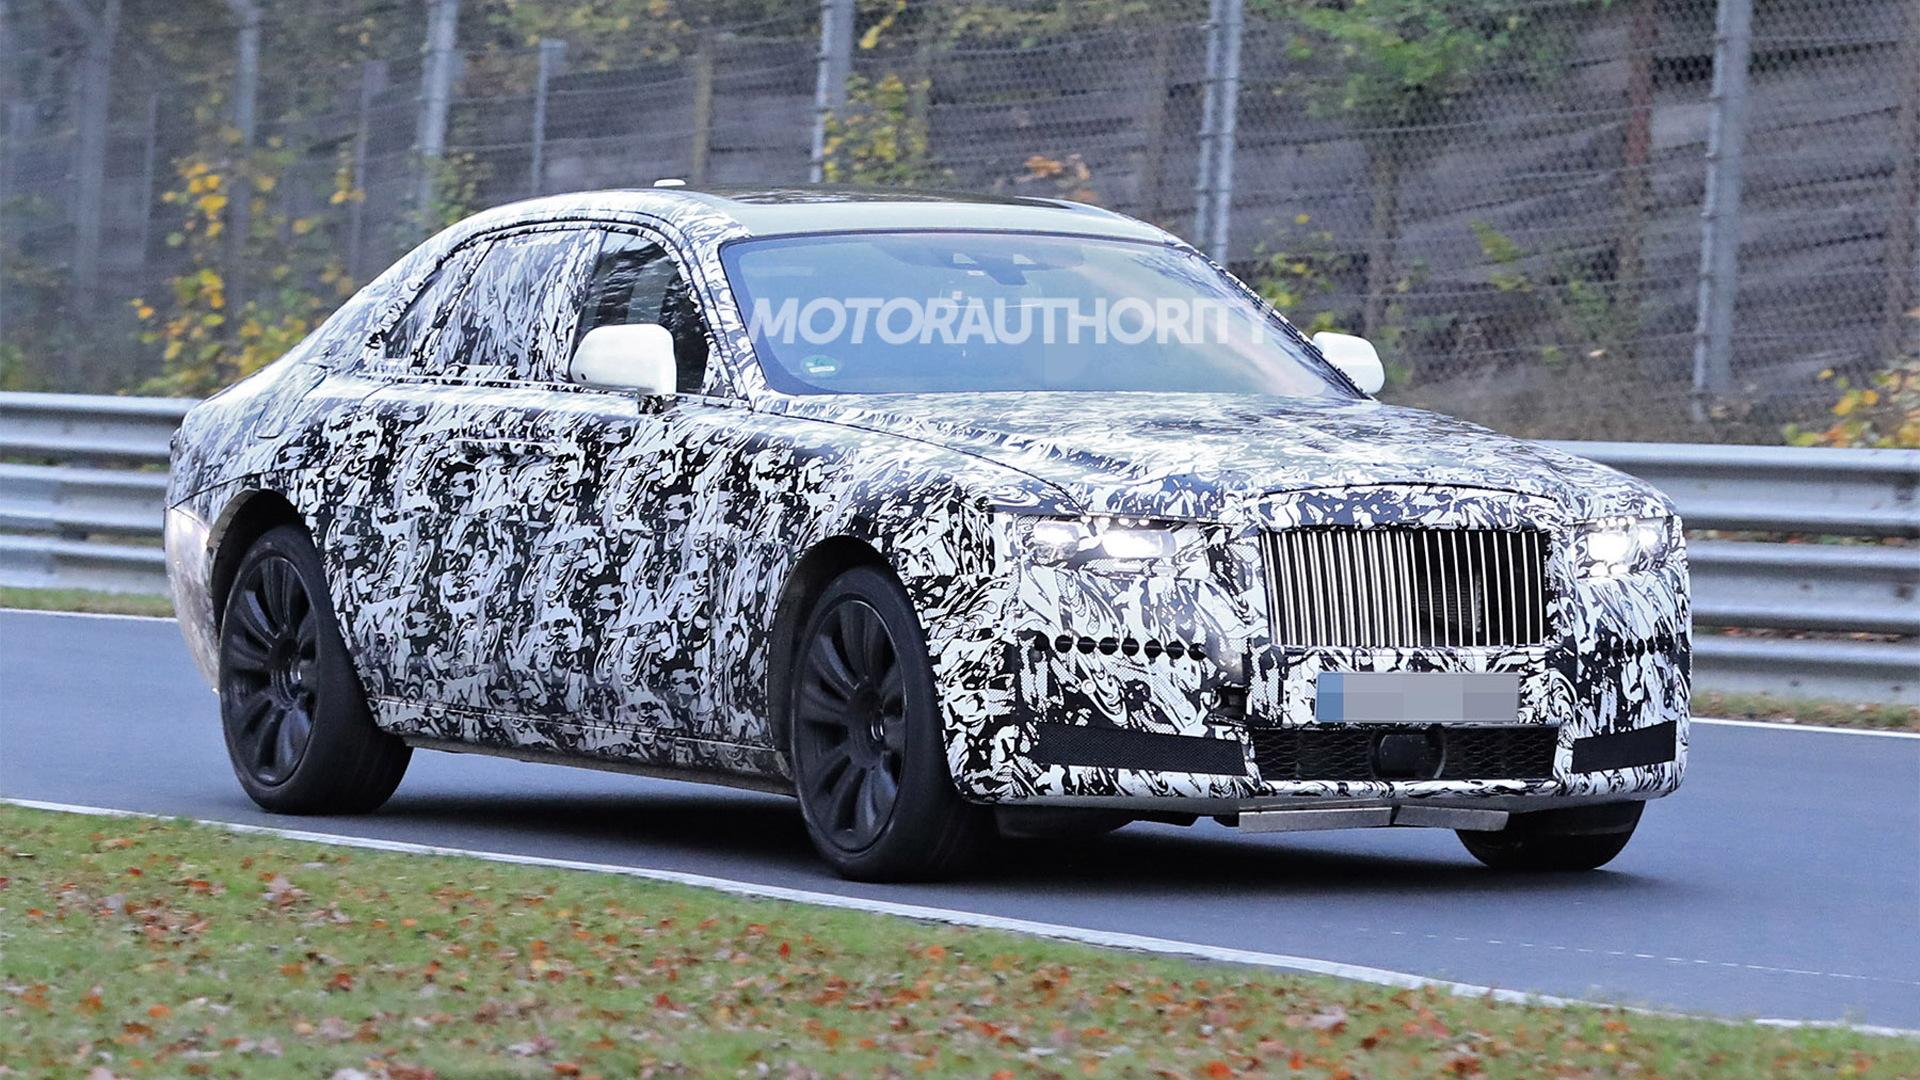 2021 Rolls-Royce Ghost spy shots - Photo credit: S. Baldauf/SB-Medien